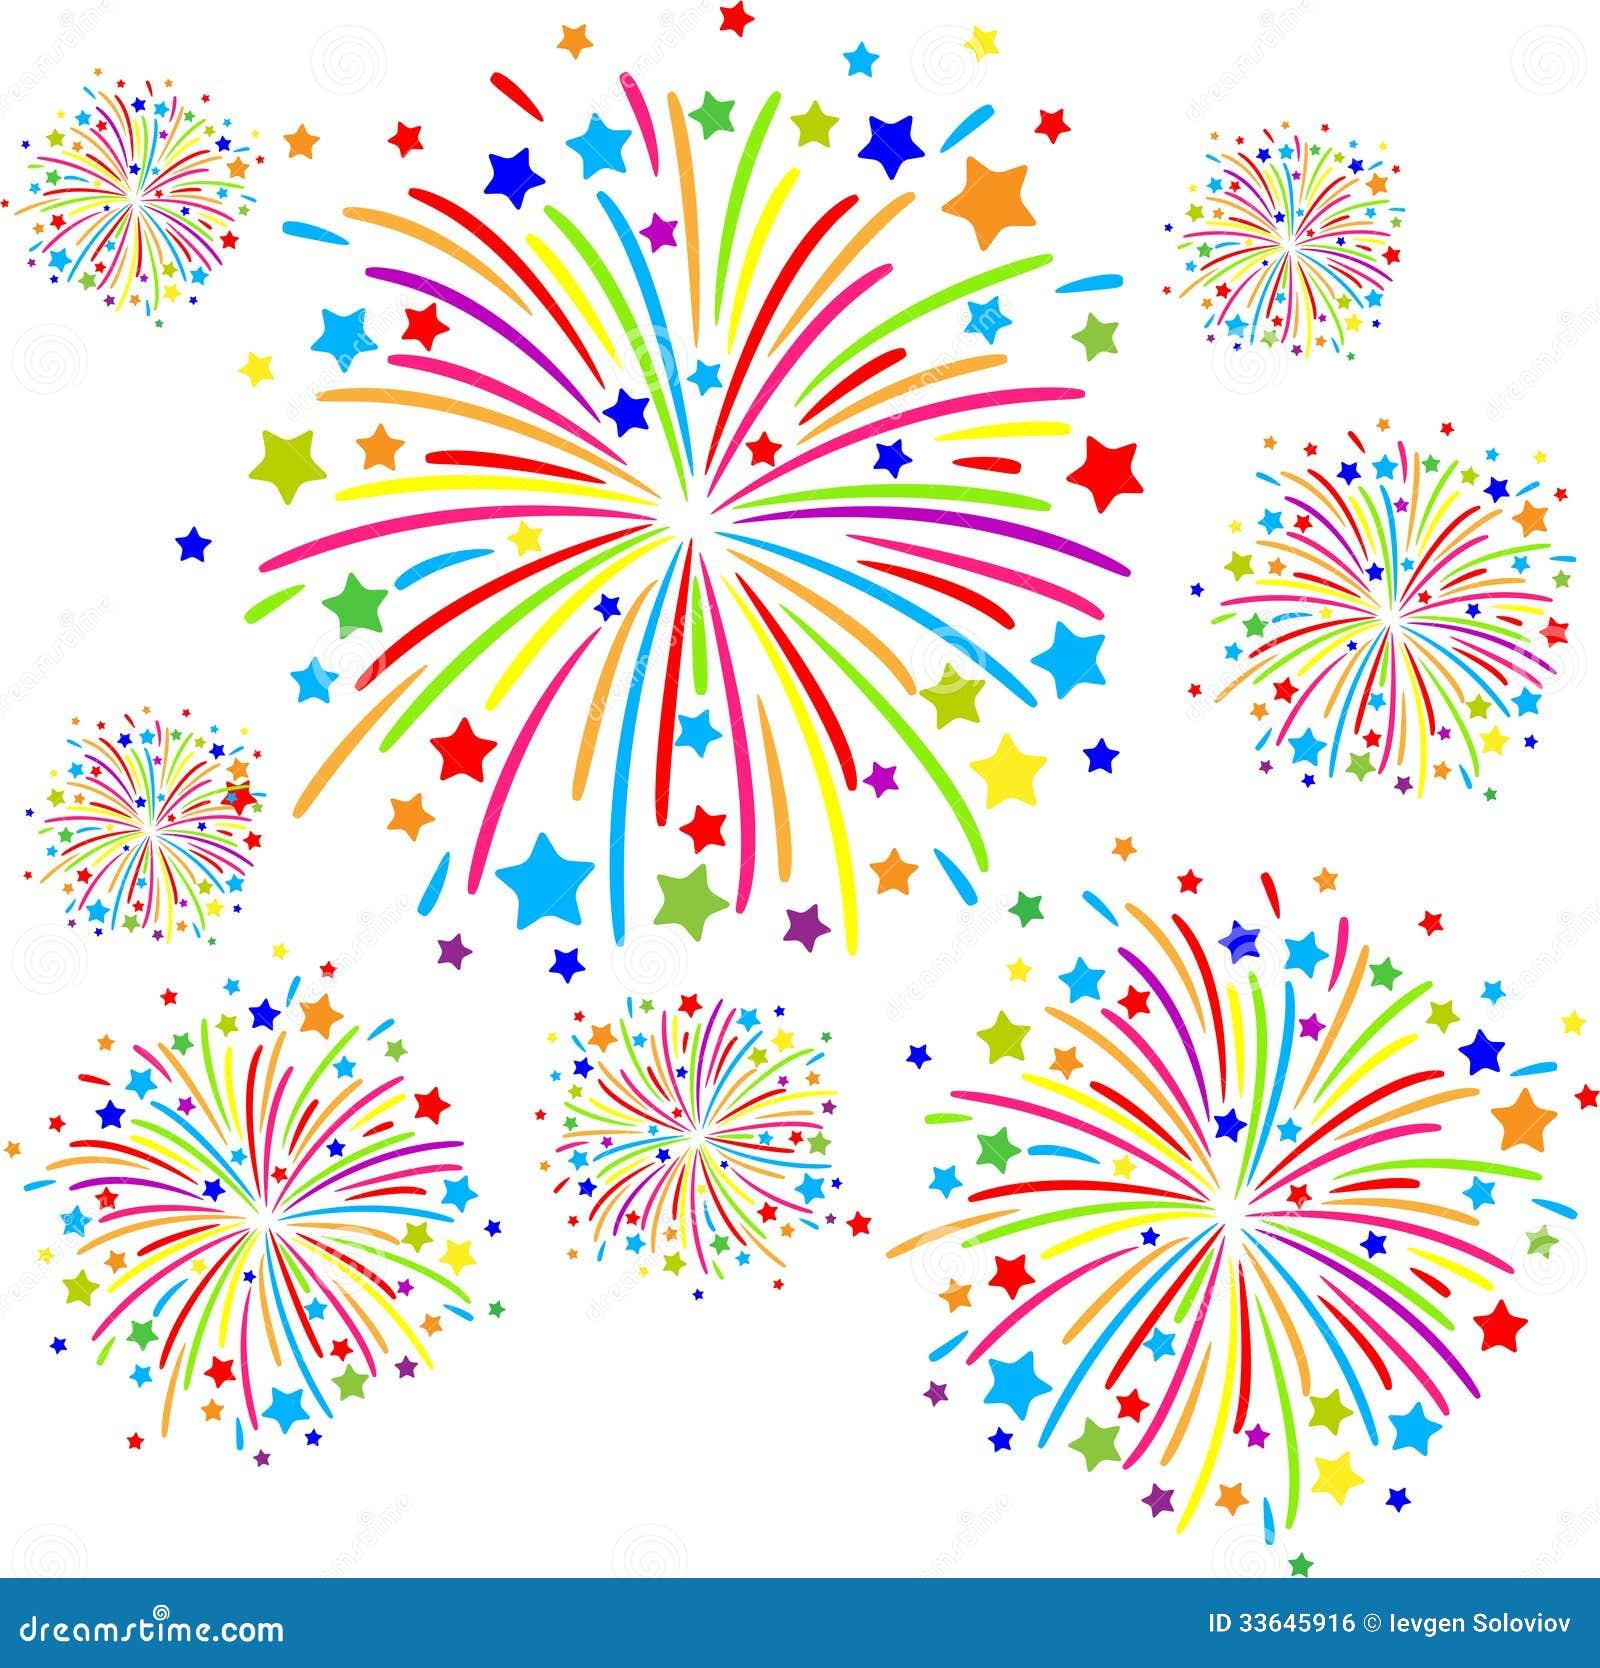 Firework Royalty Free Stock Image - Image: 33645916